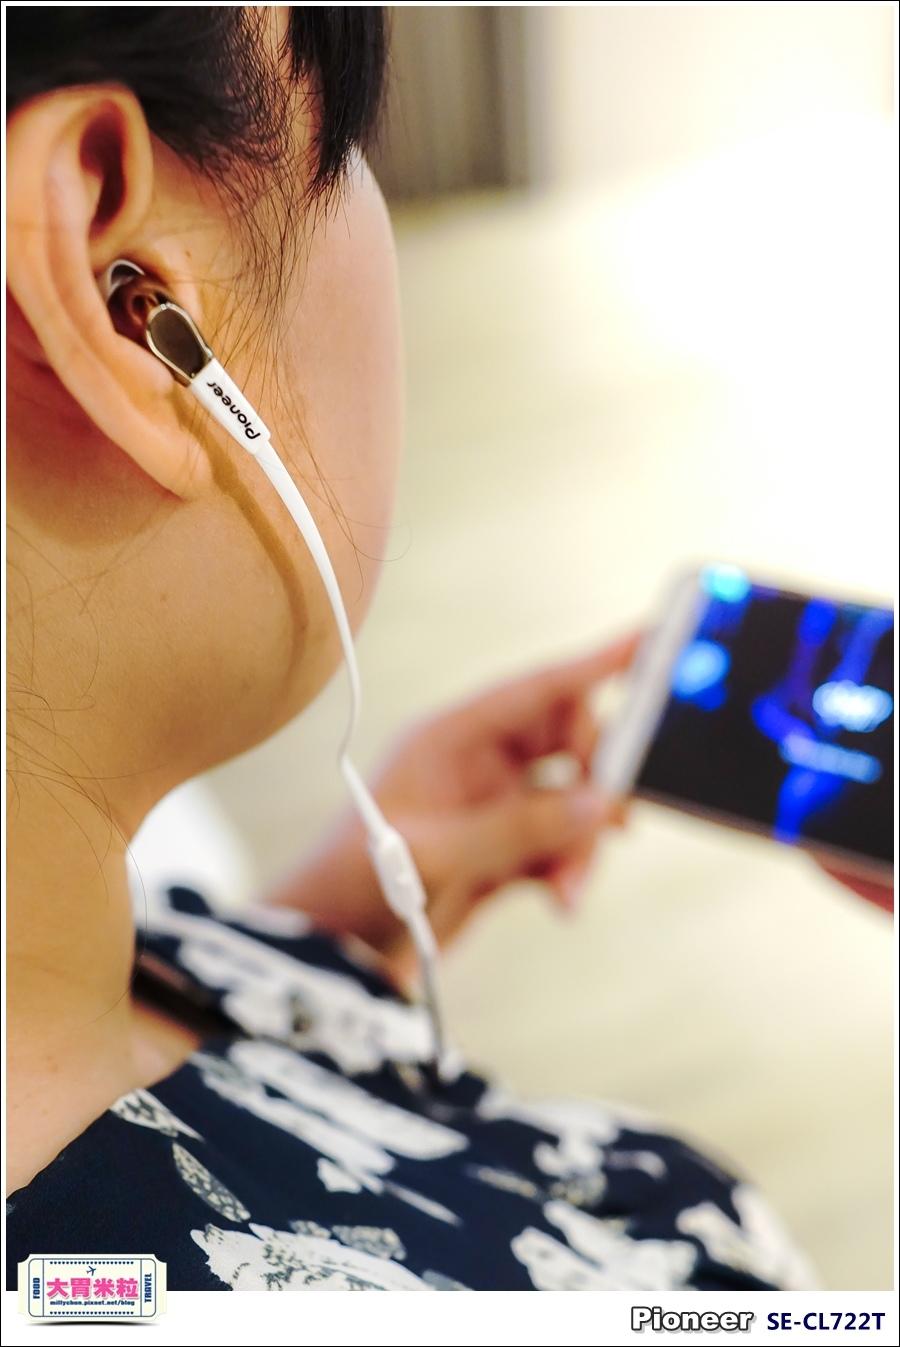 Pioneer入門級耳機SE-CL722T@大胃米粒015.jpg